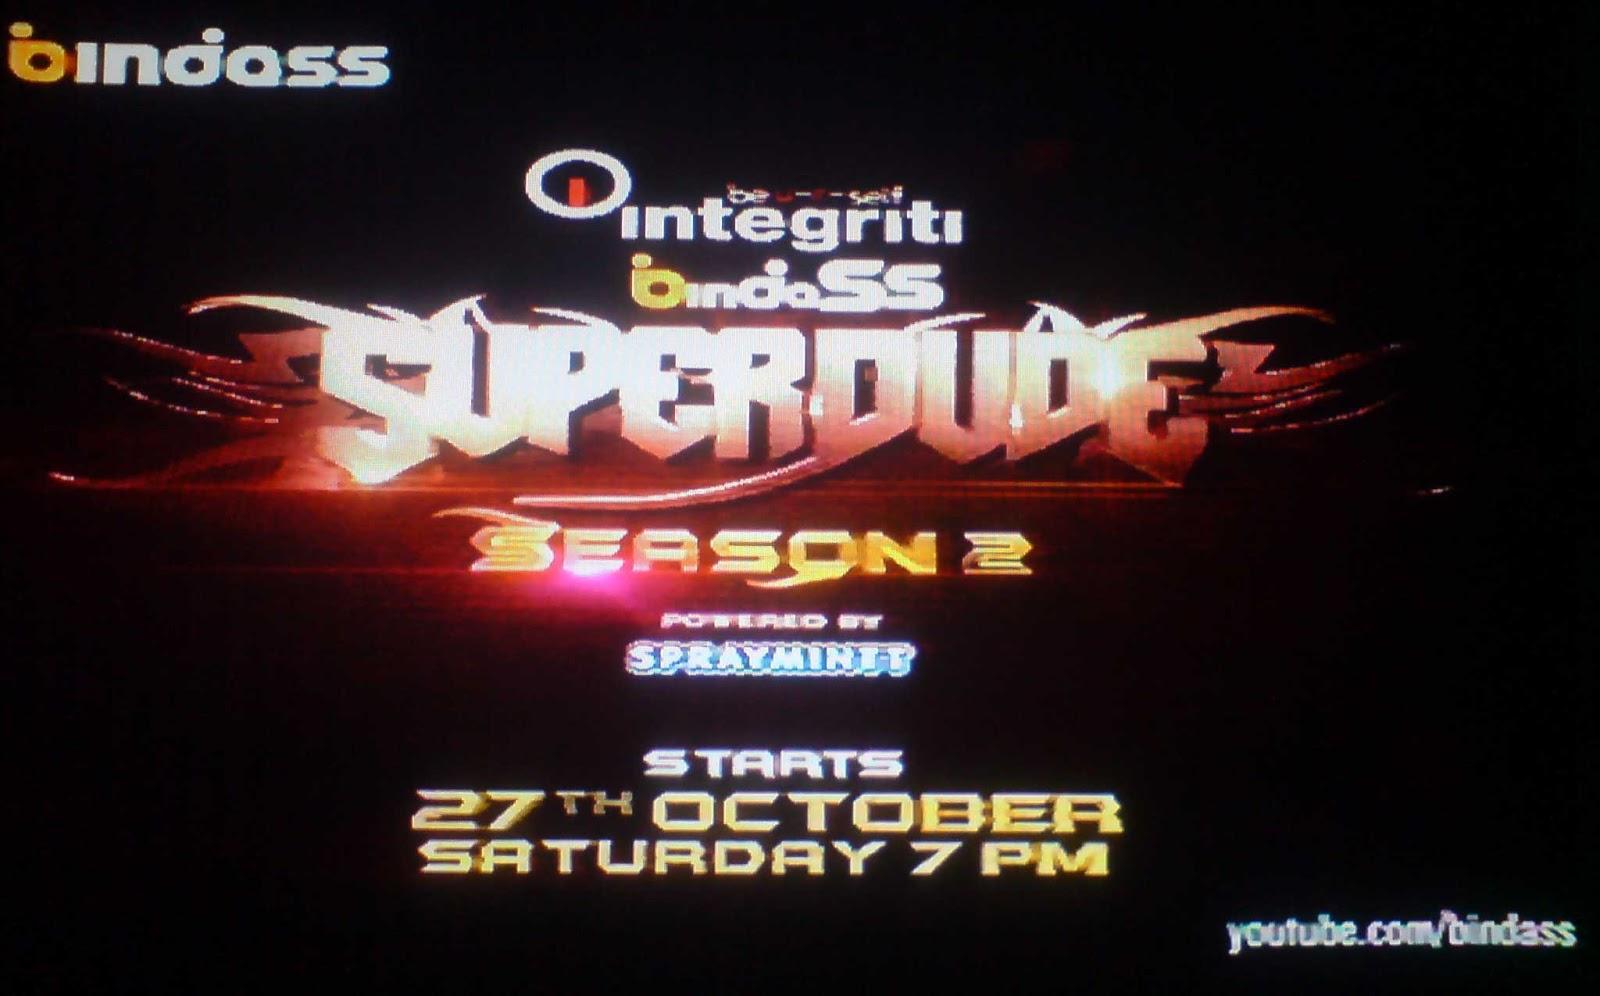 Superdude Season 2